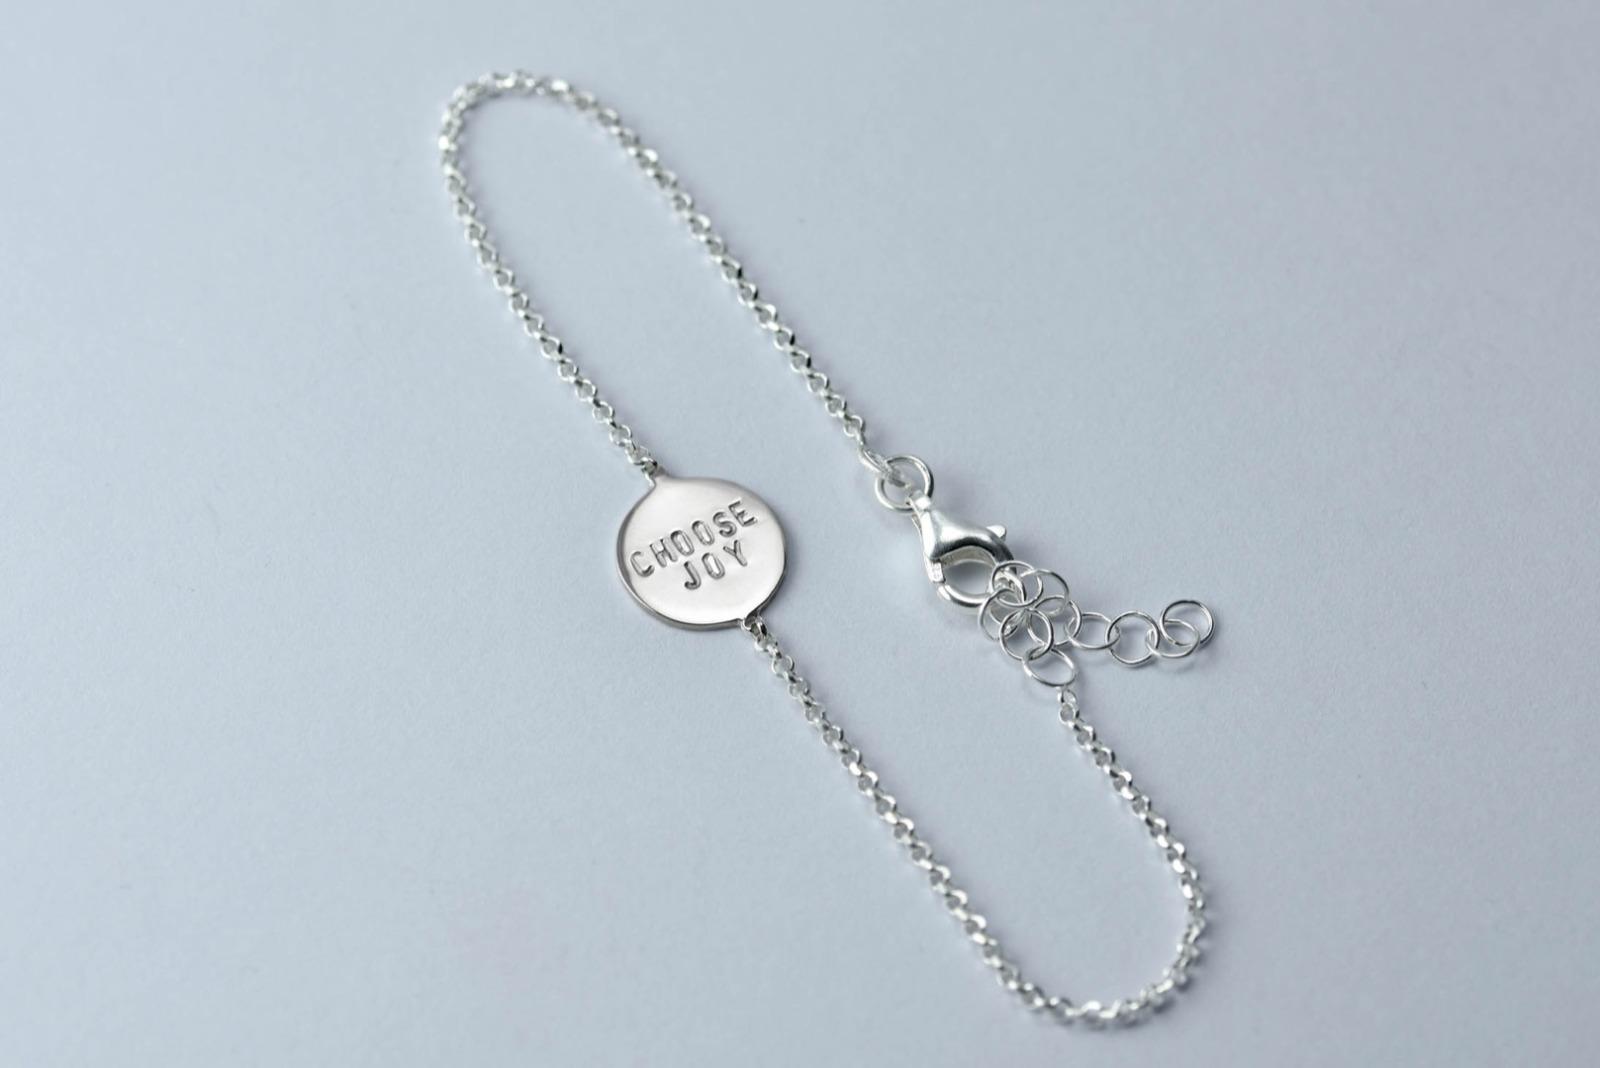 Zartes Silberarmband 2 - Namens-, Geburts-, Sprucharmband